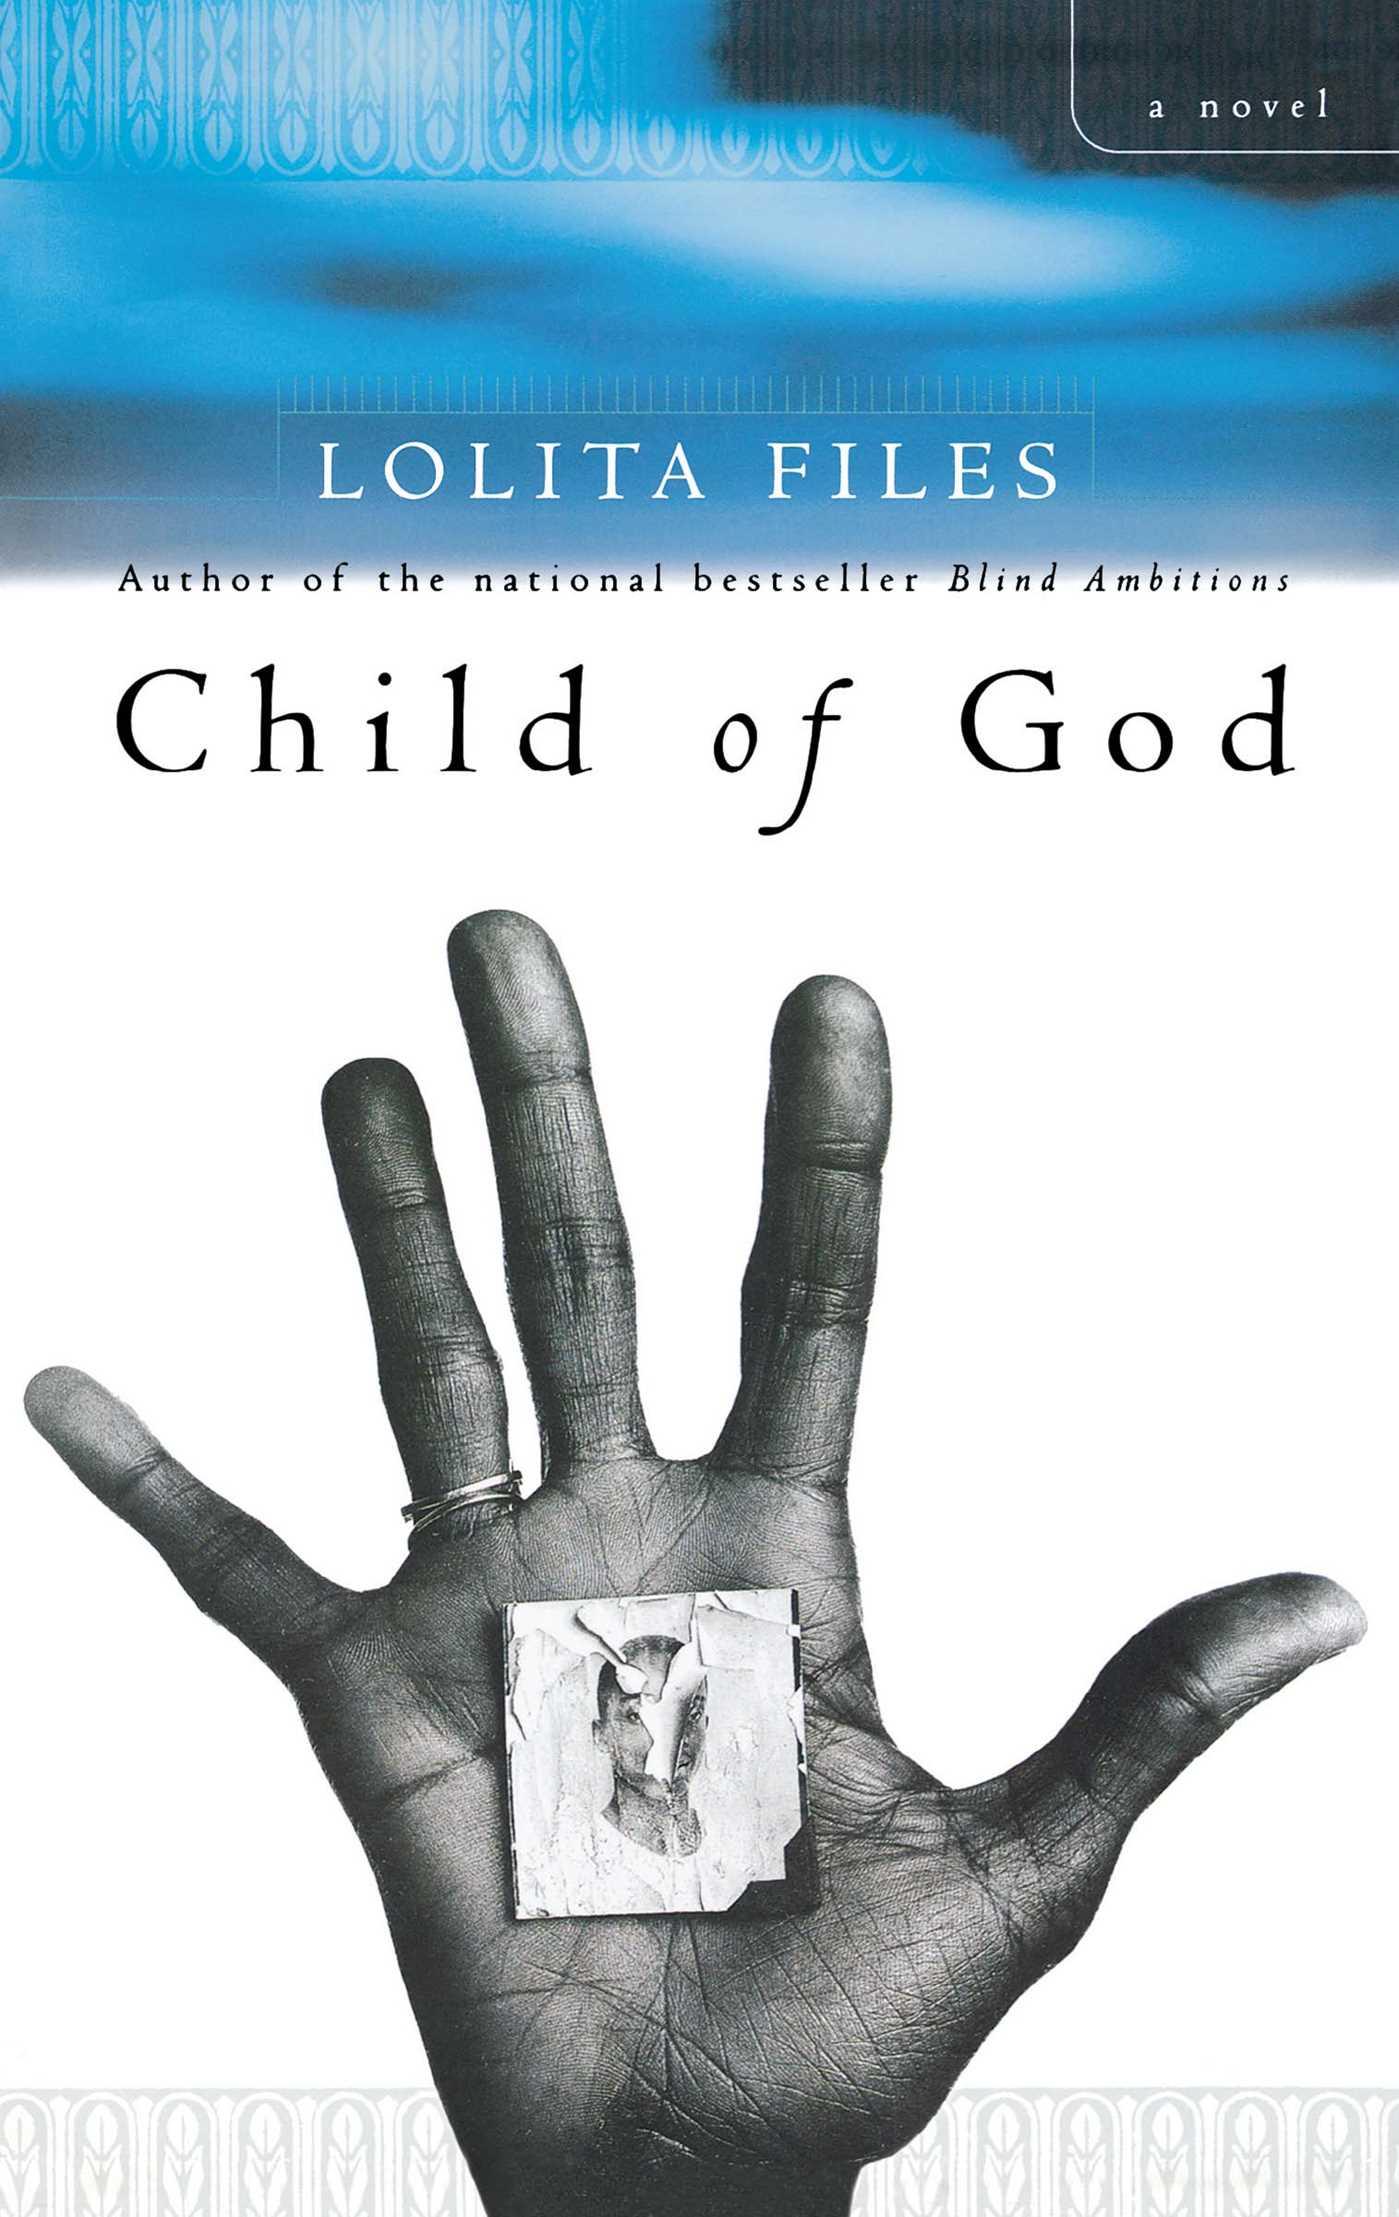 Child of god 9780743225915 hr